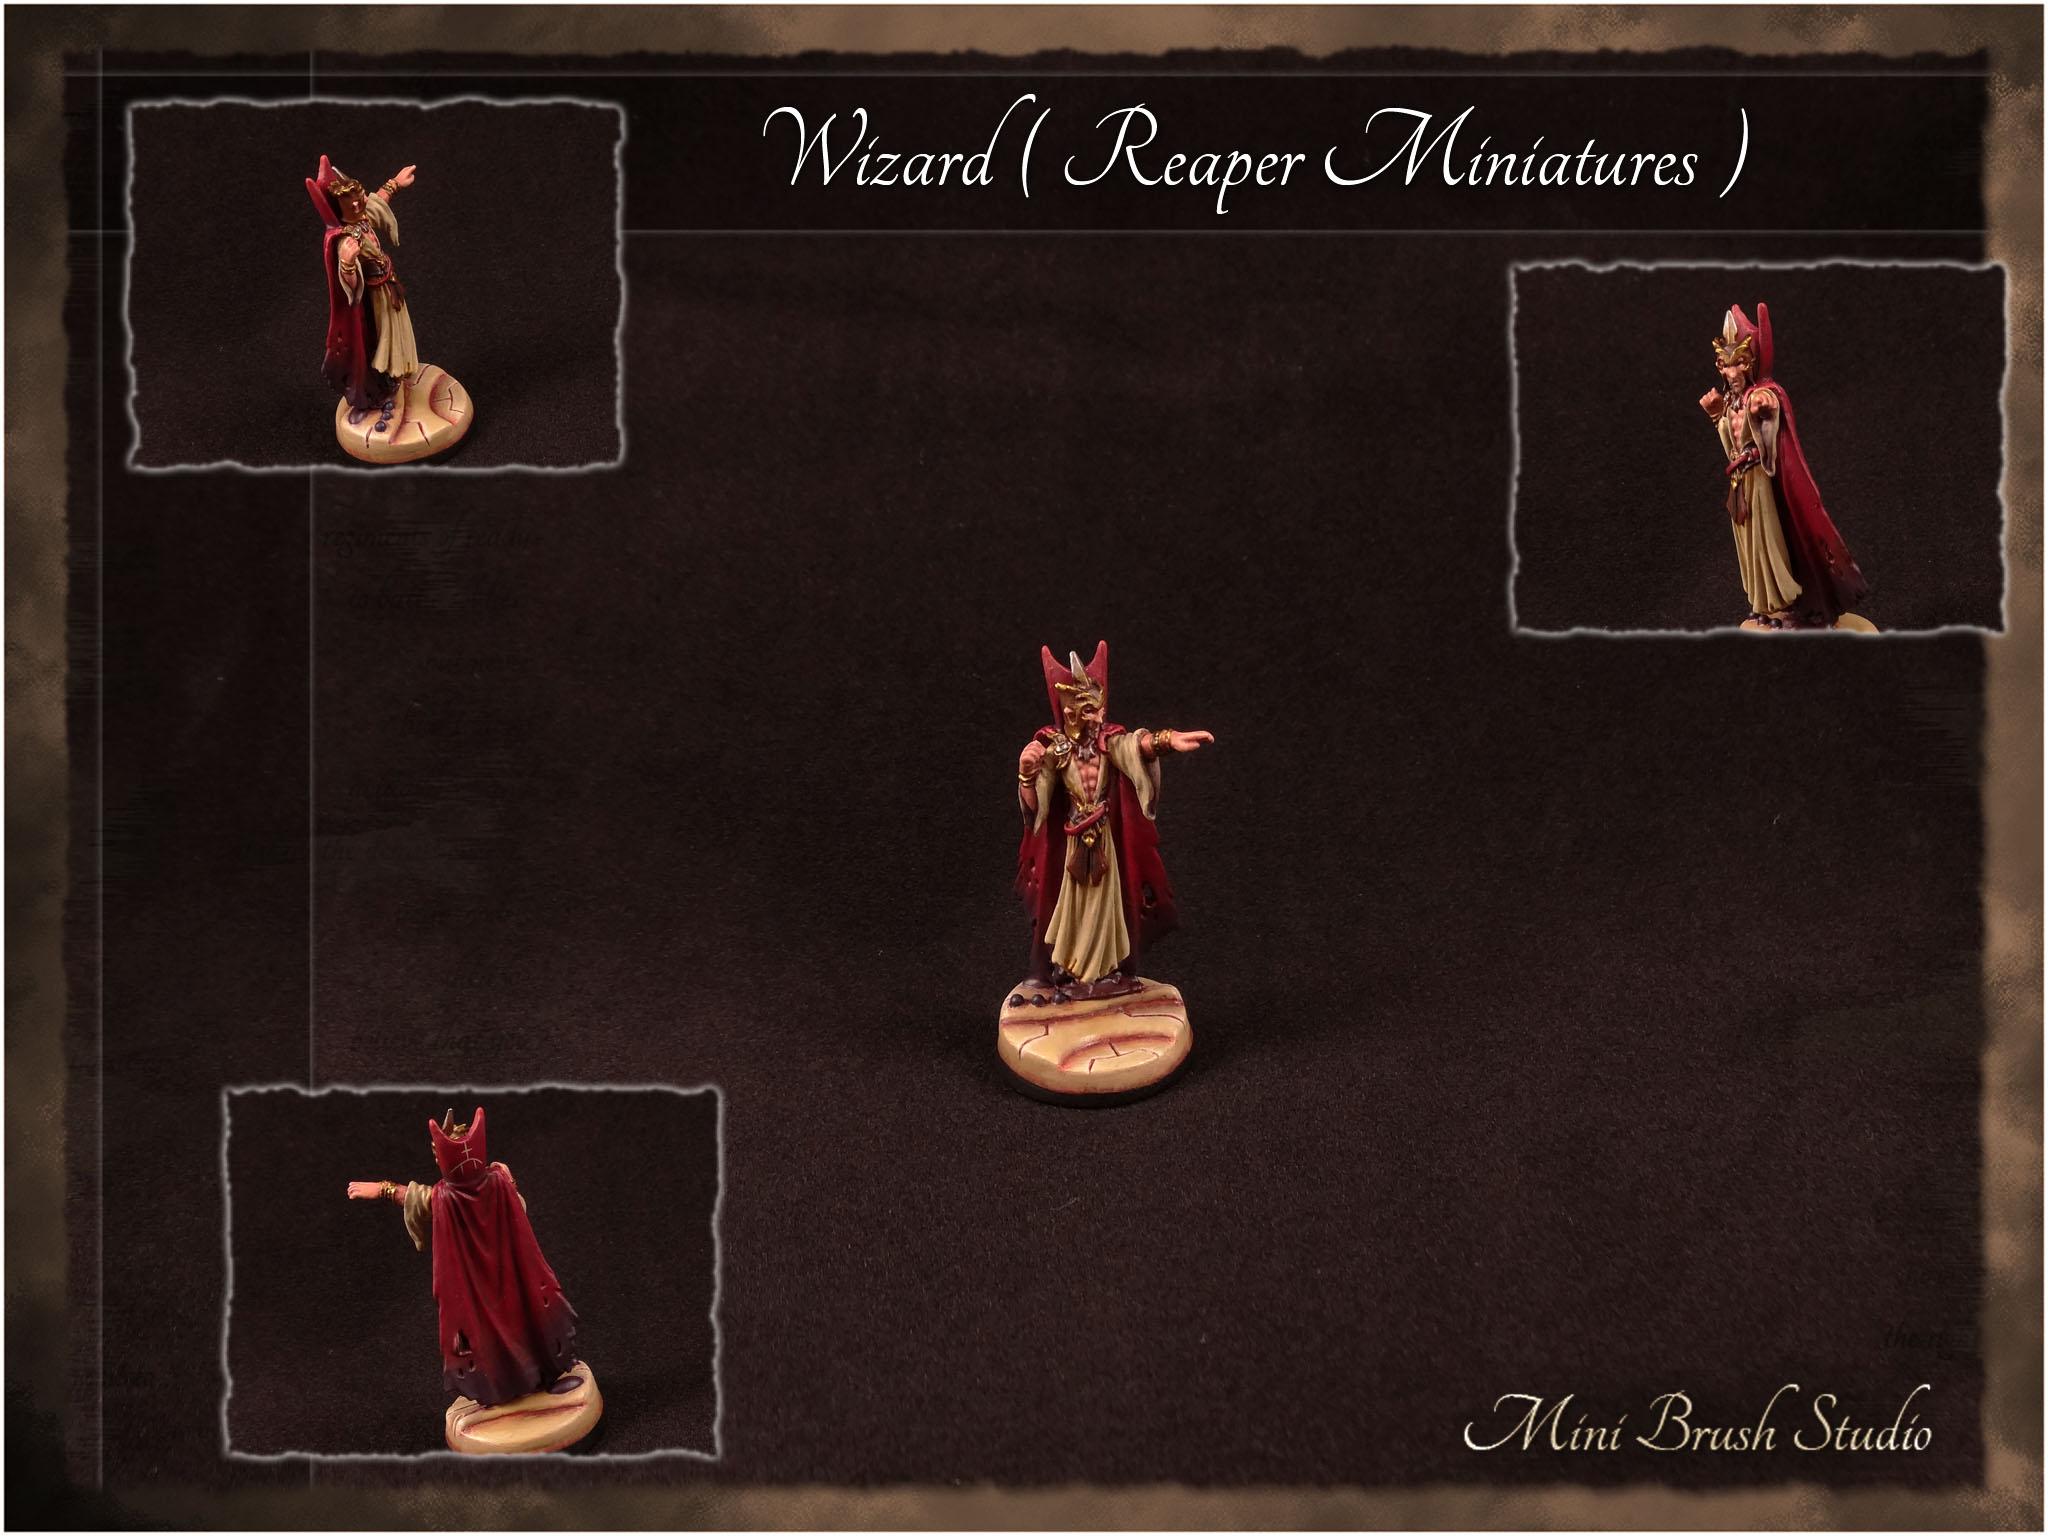 Wizard ( Reaper Miniatures ) 1 v7.00.jpg